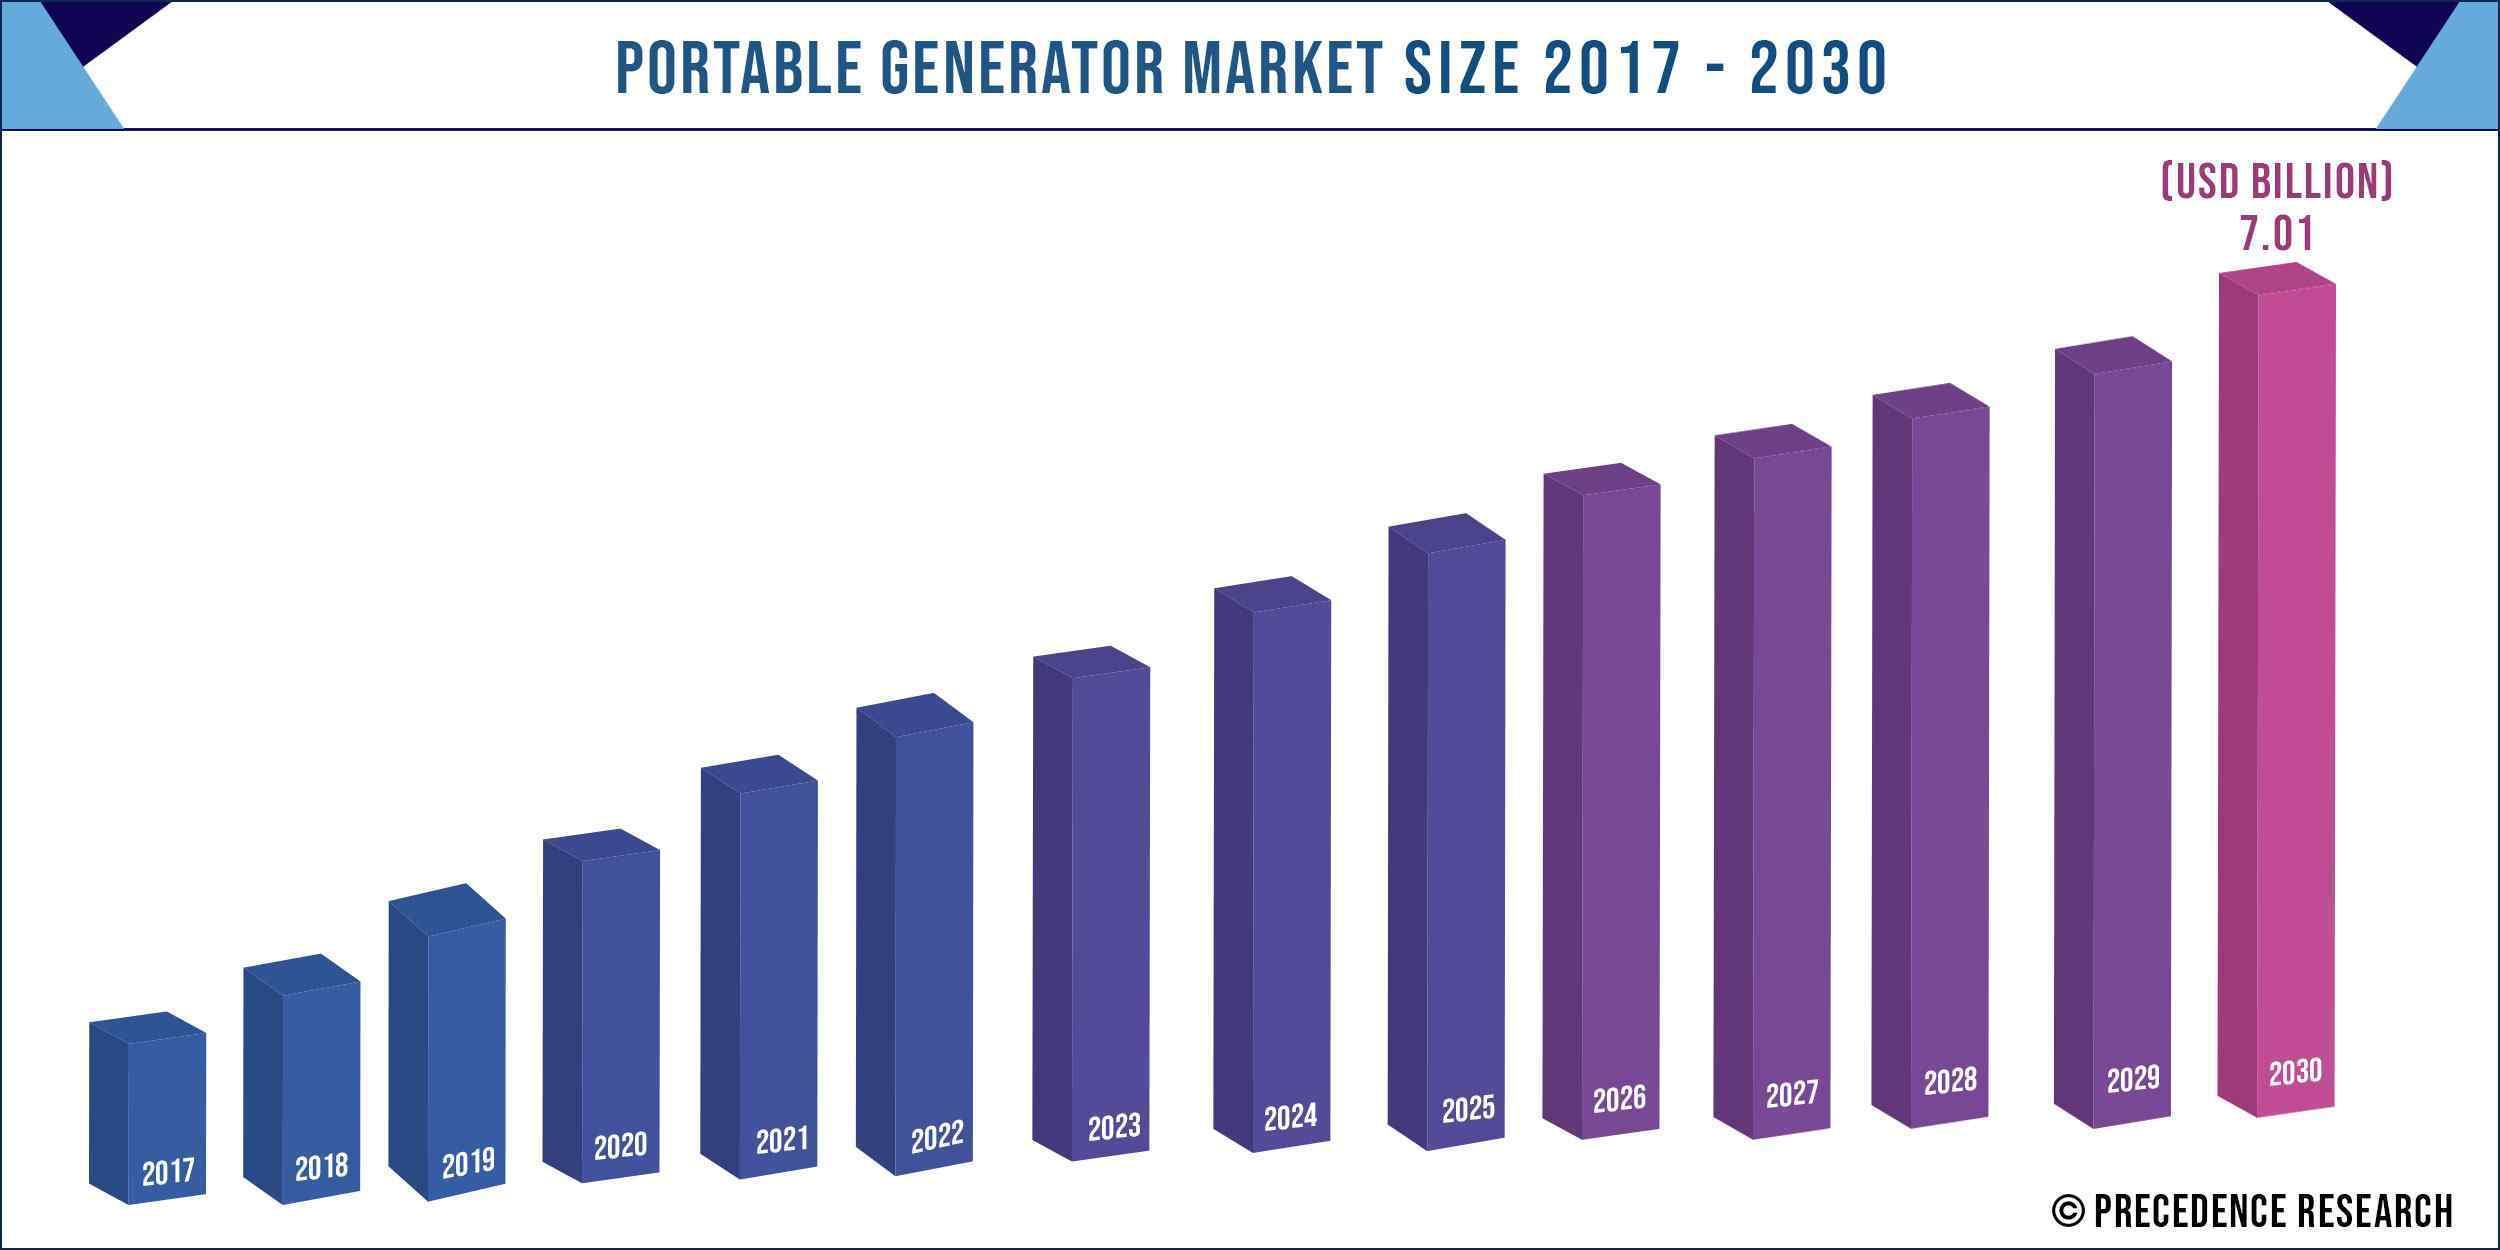 Portable Generator Market Size 2017 to 2030